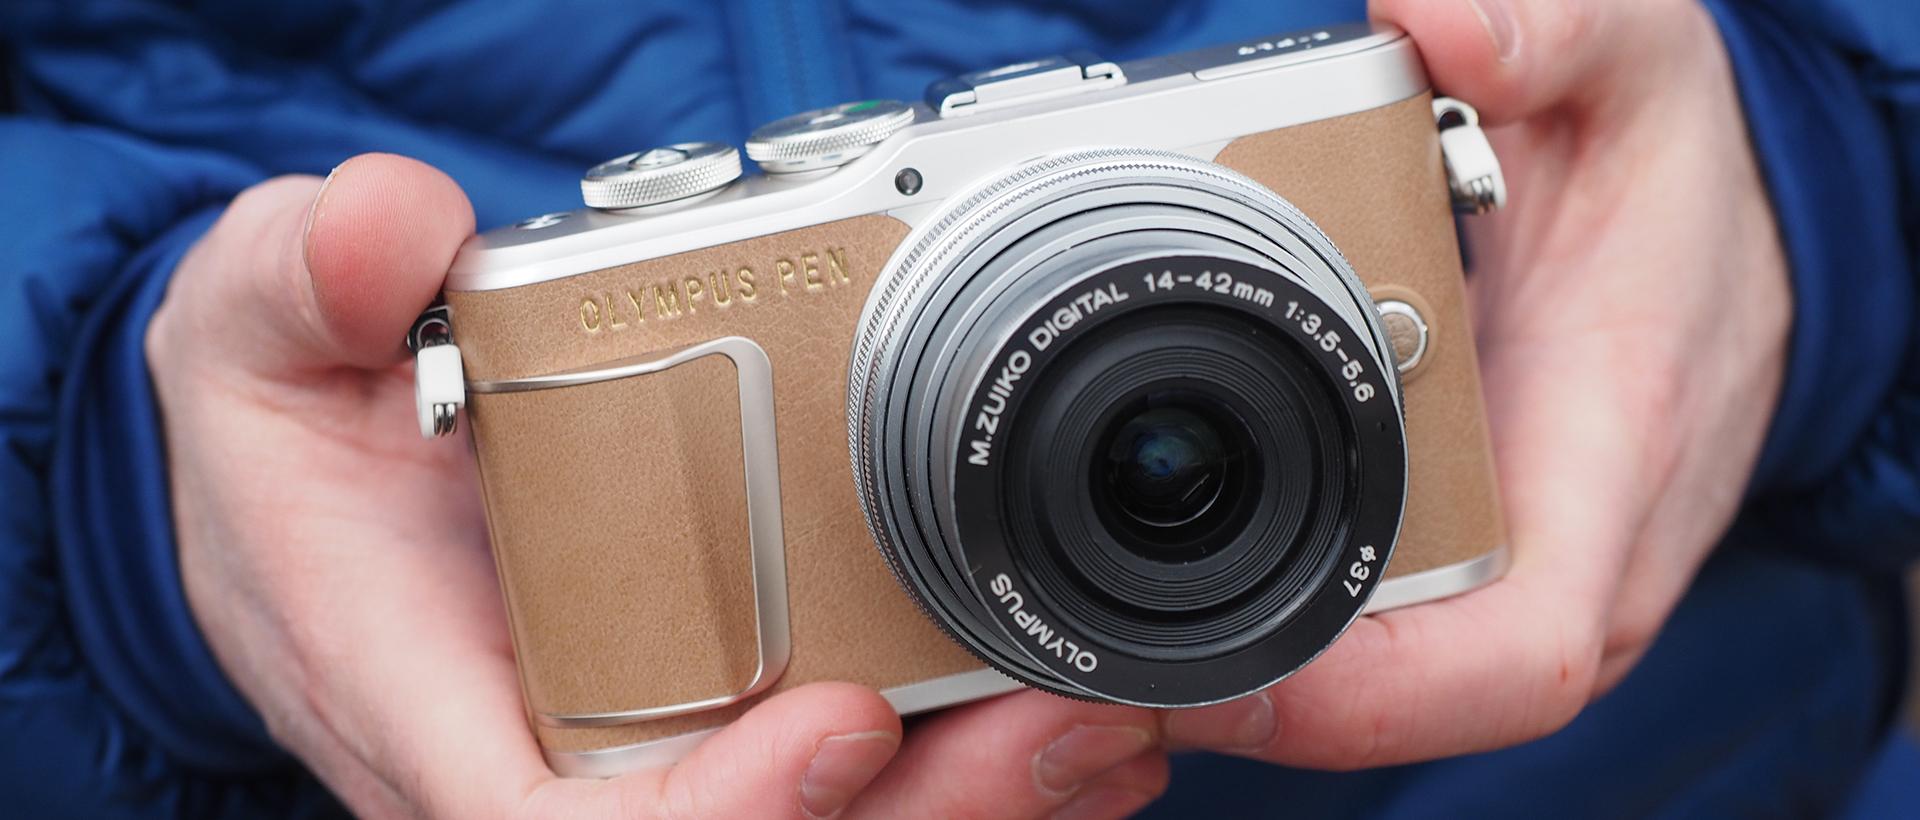 Olympus systemkamera testsieger dating